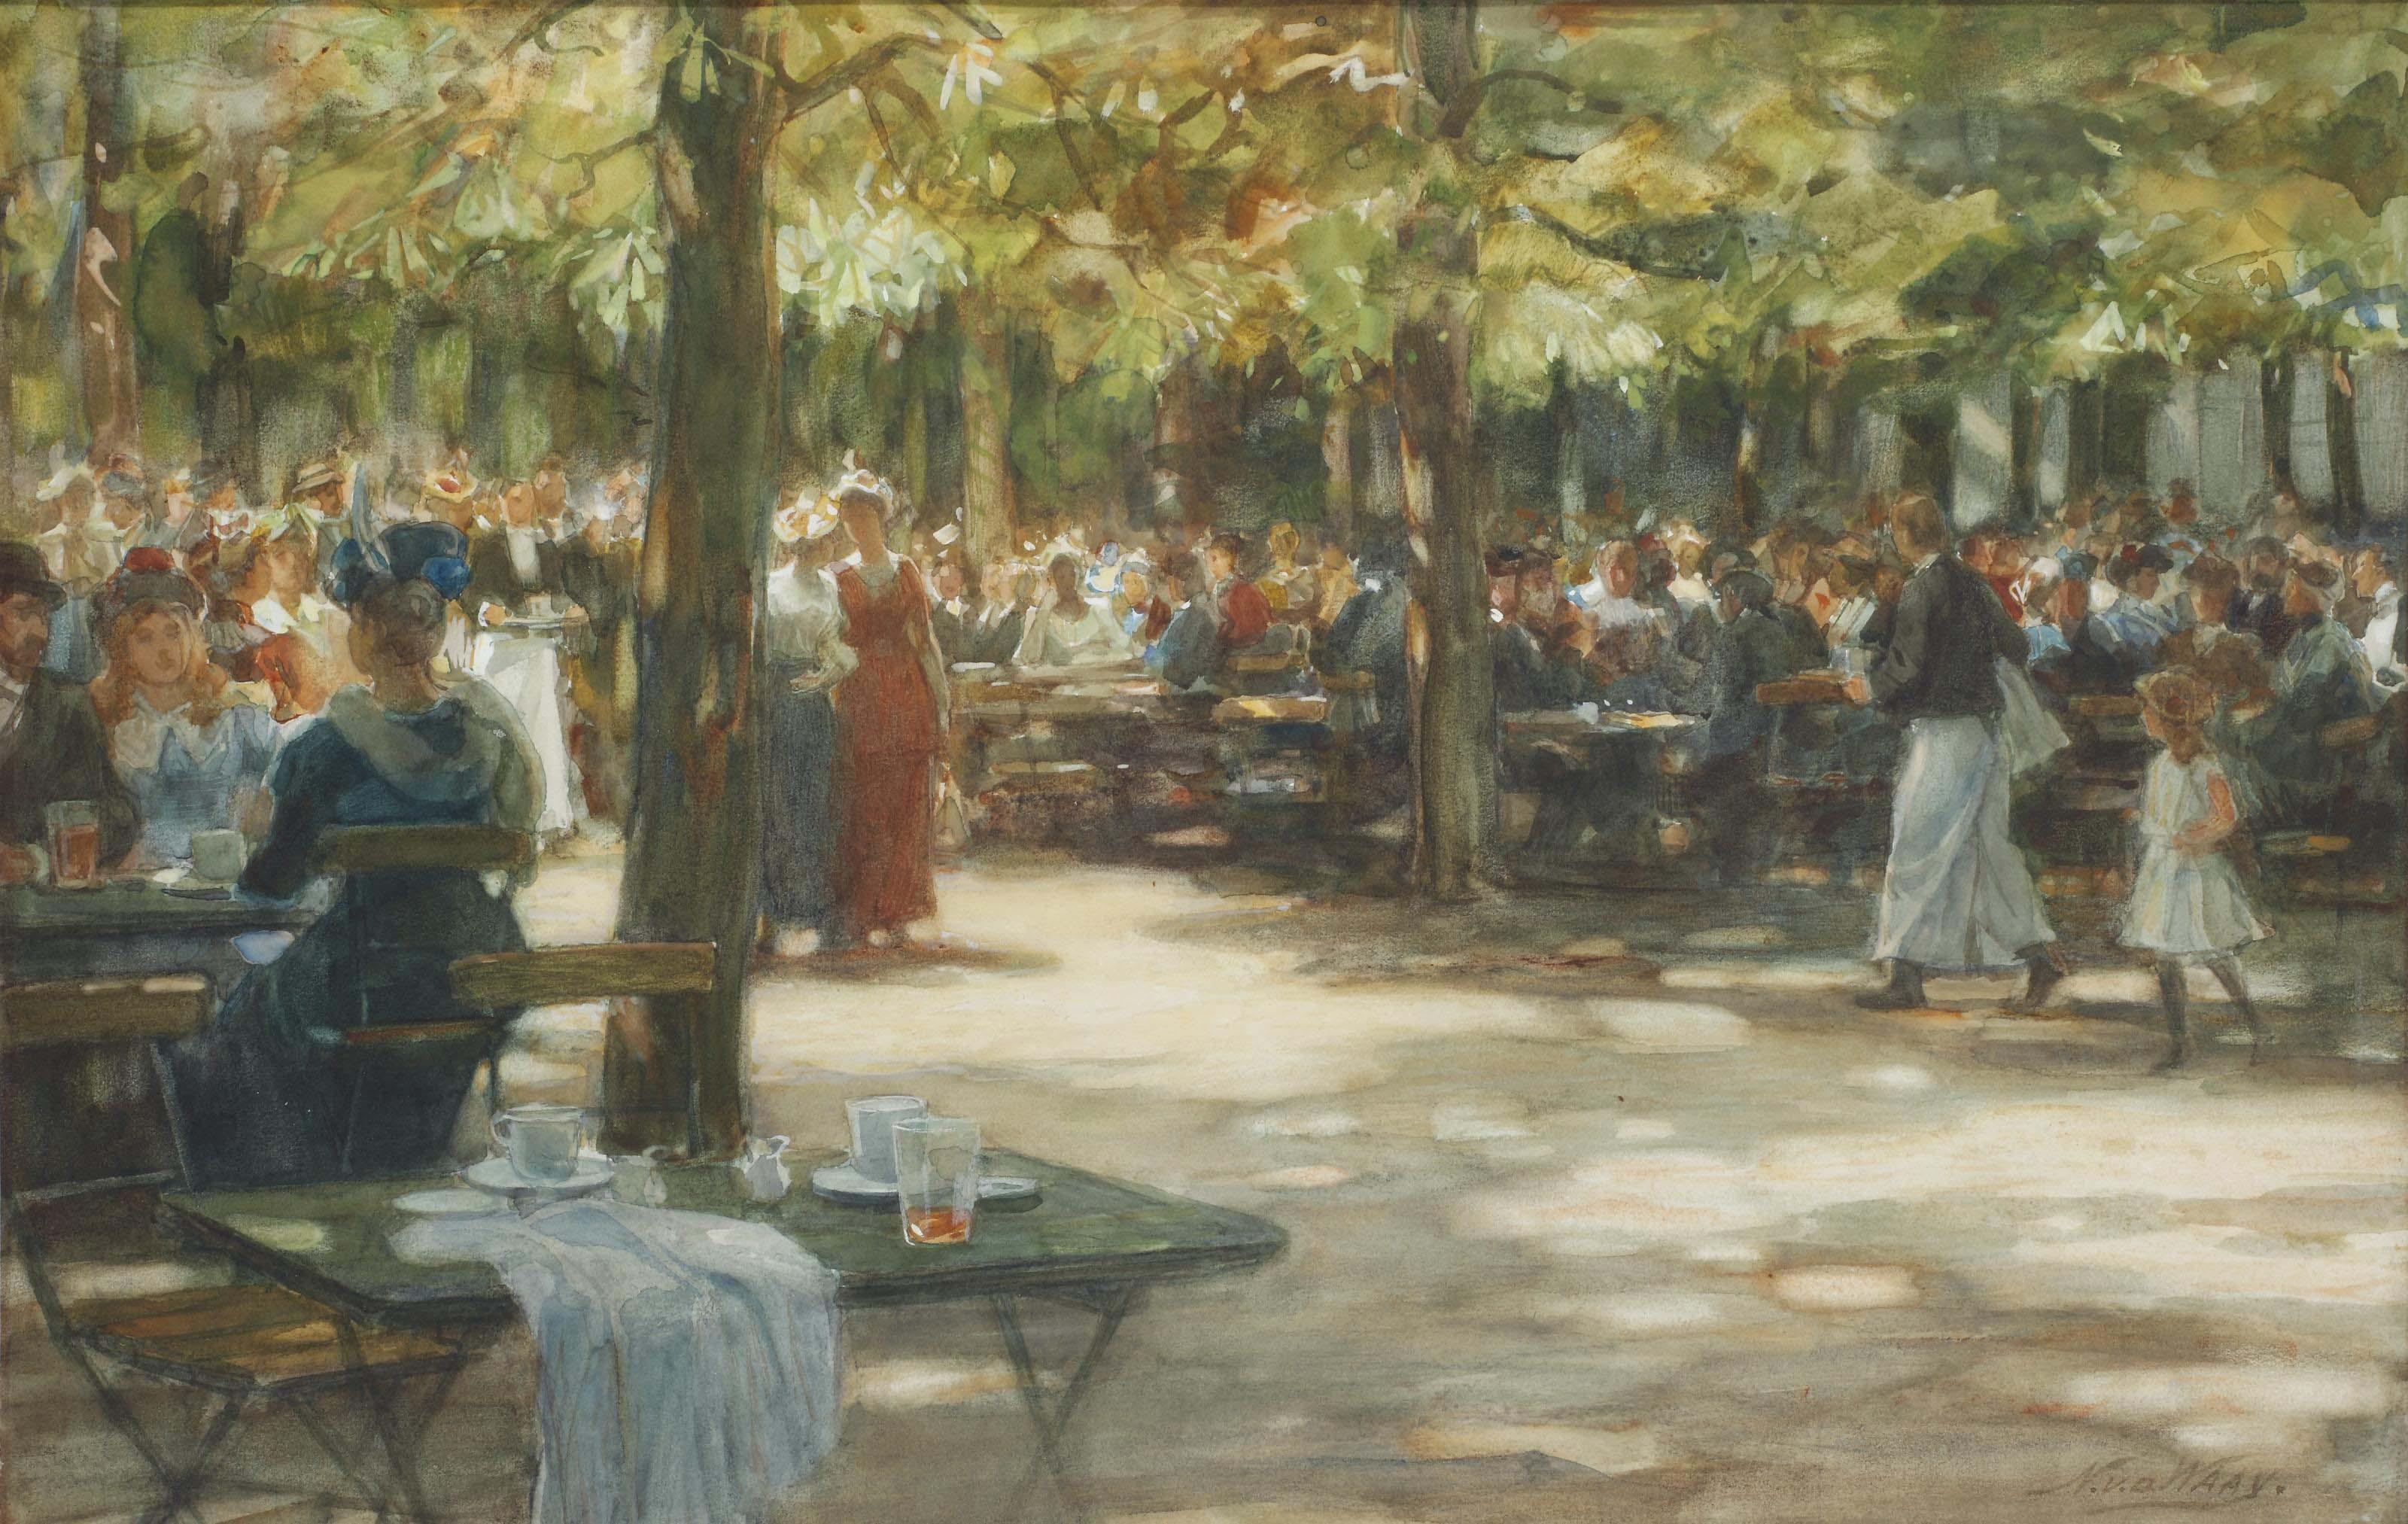 Vrijdagavondconcert, Artis: after the concert, in the gardens of Artis Royal Zoo, Amsterdam